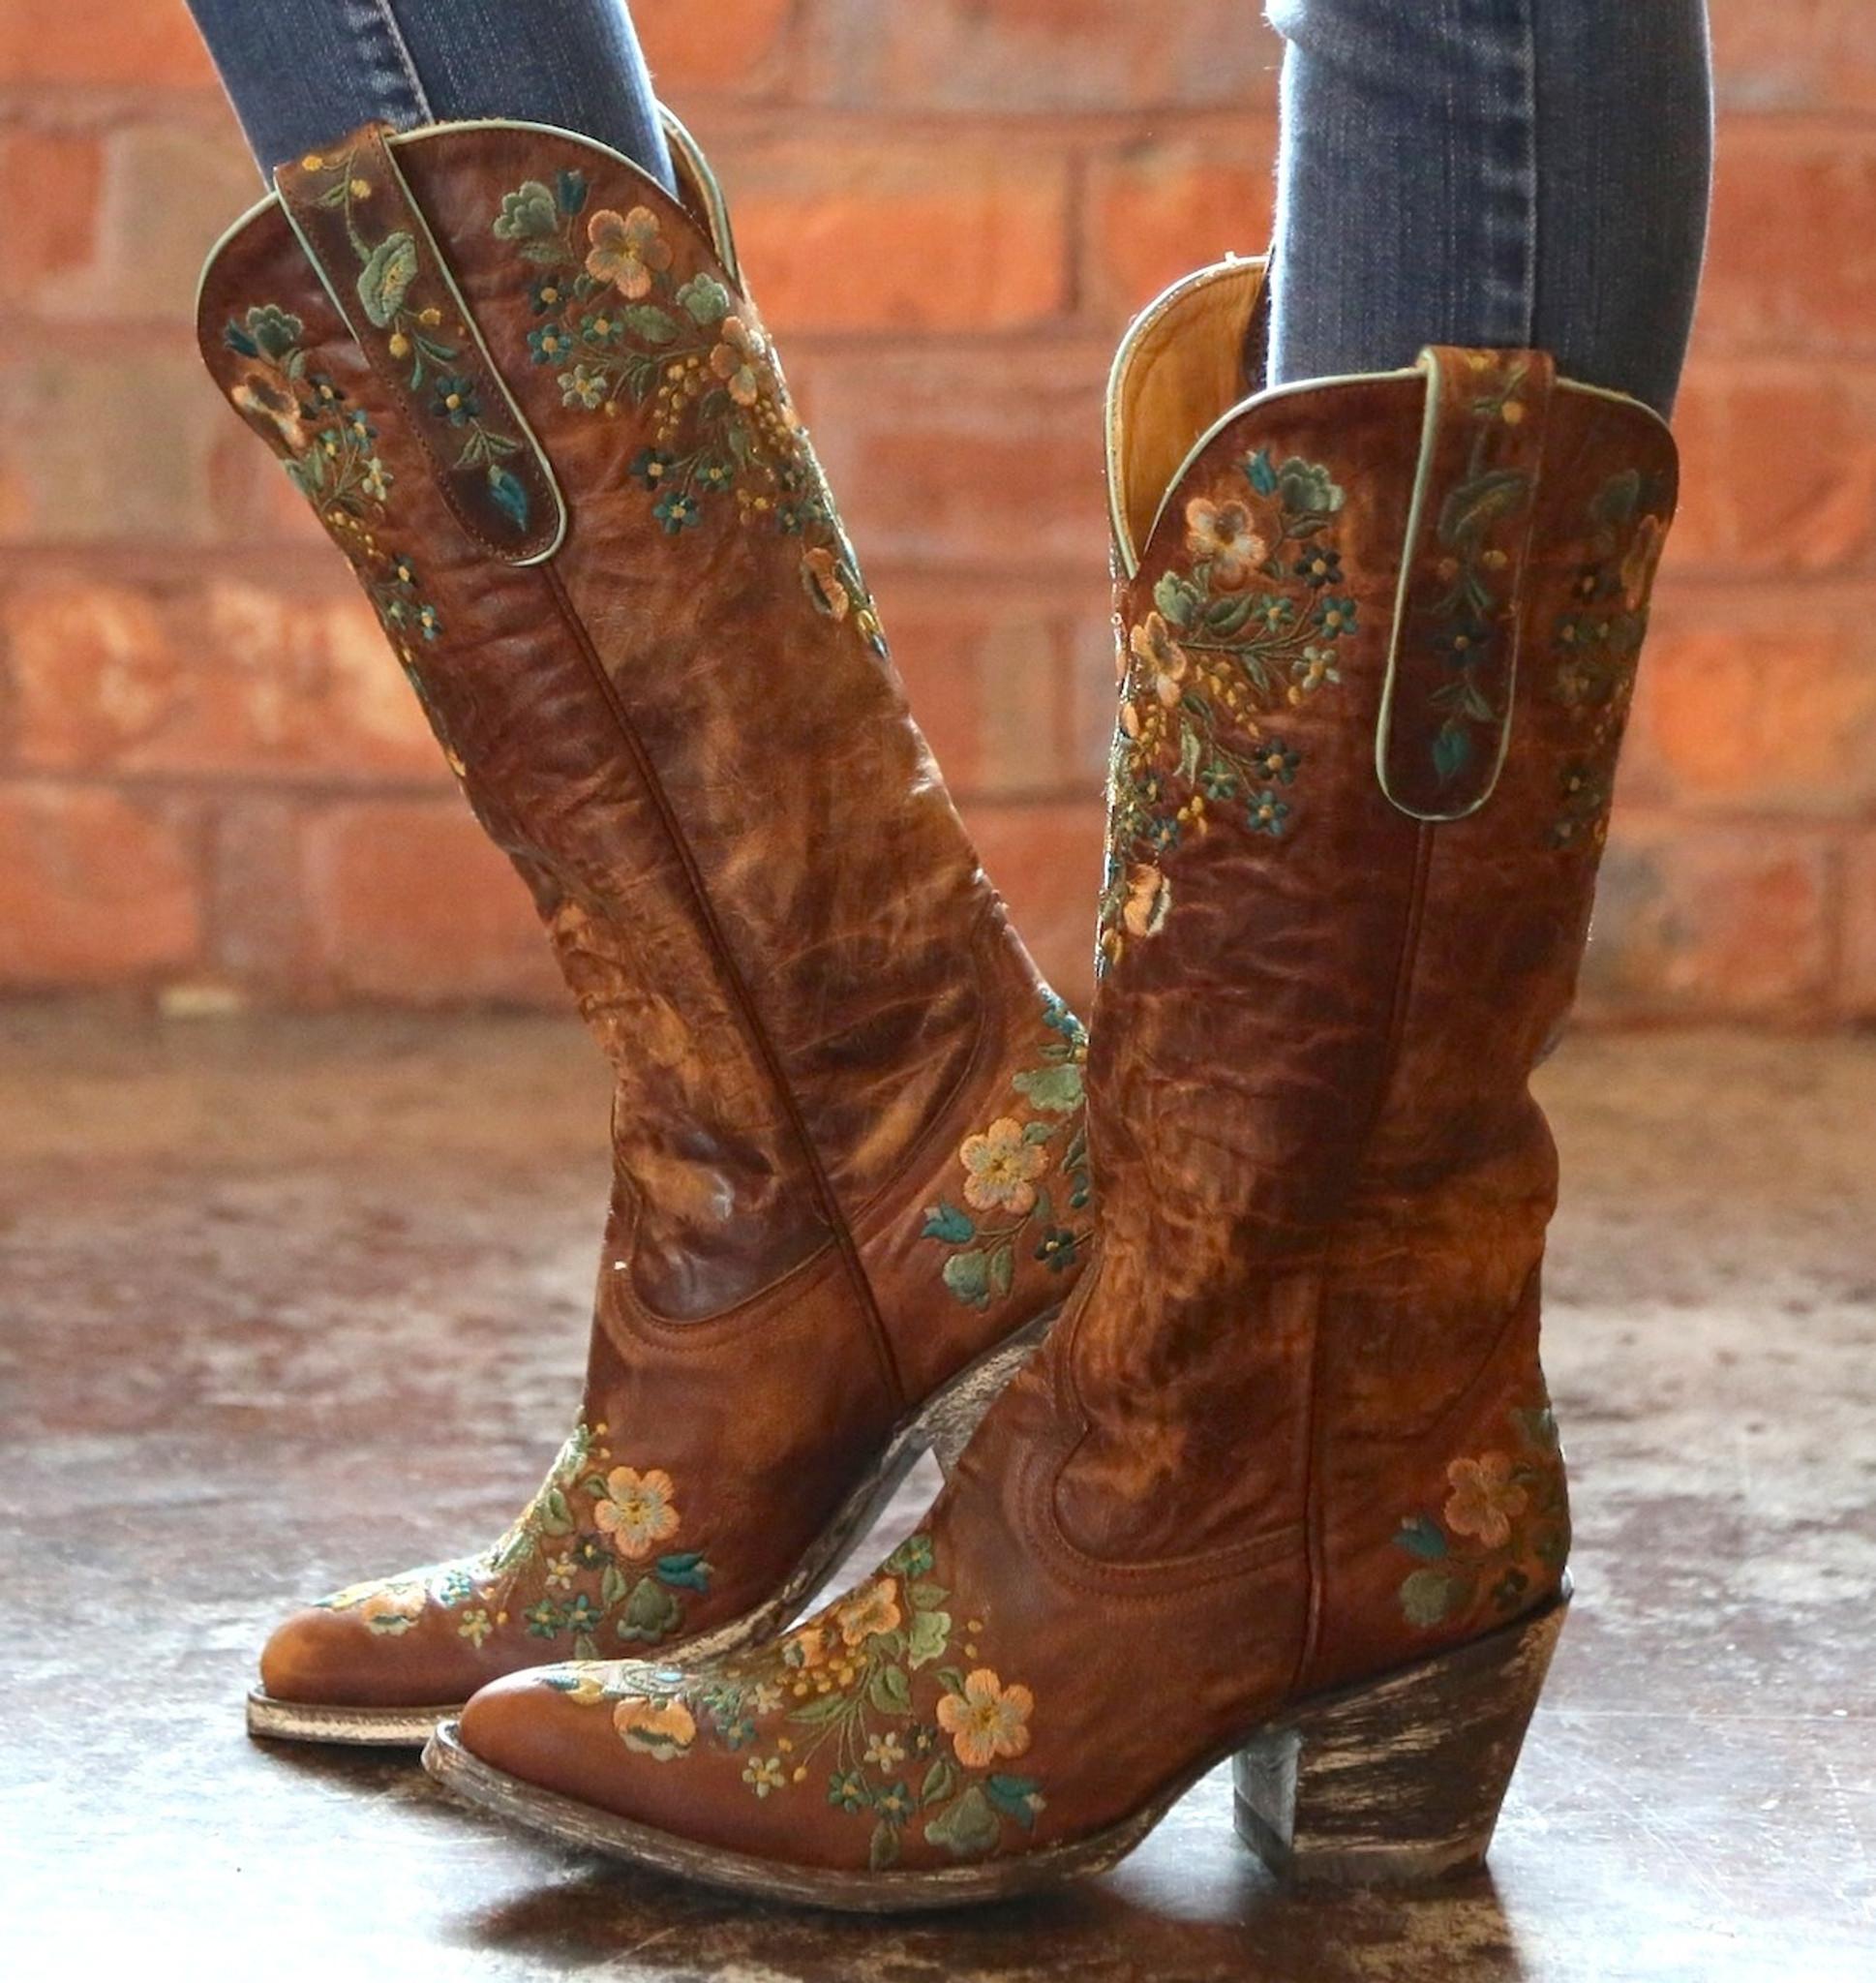 Old Gringo Sora Brass Teal Boot Old Gringo Boots L841 4